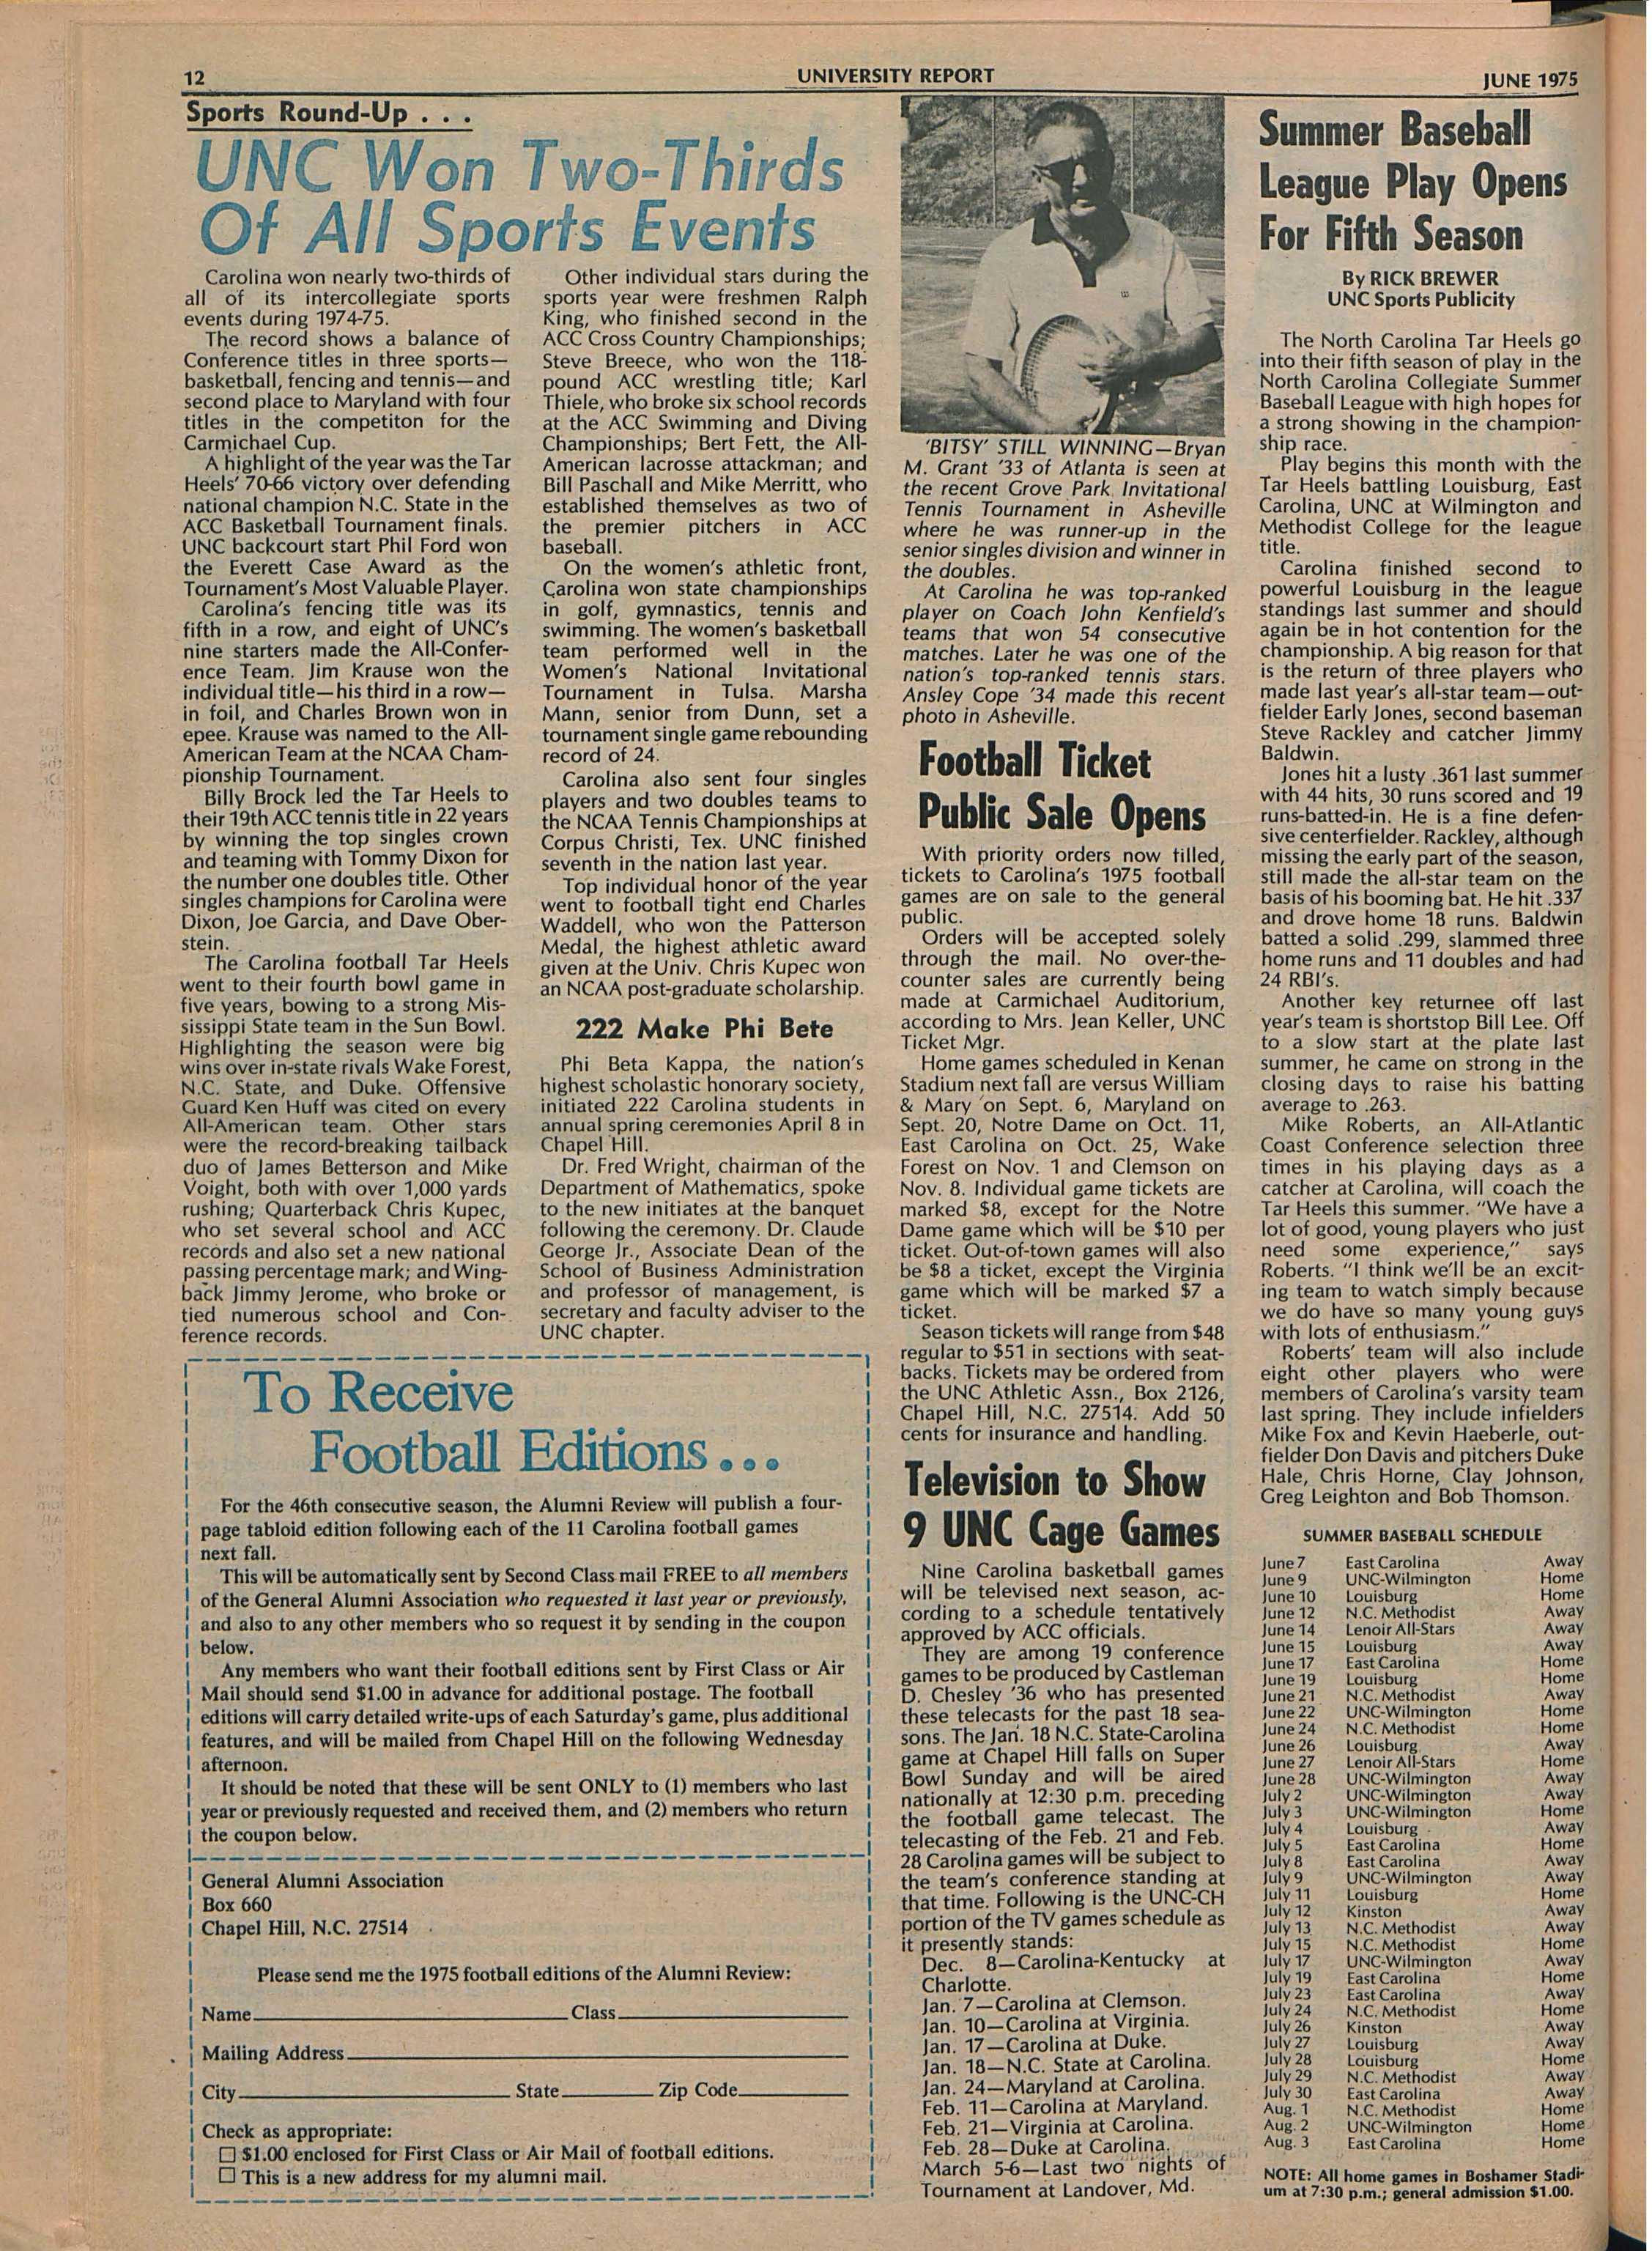 The University Report - June 1975 - page 12 3b9c31354fdd9